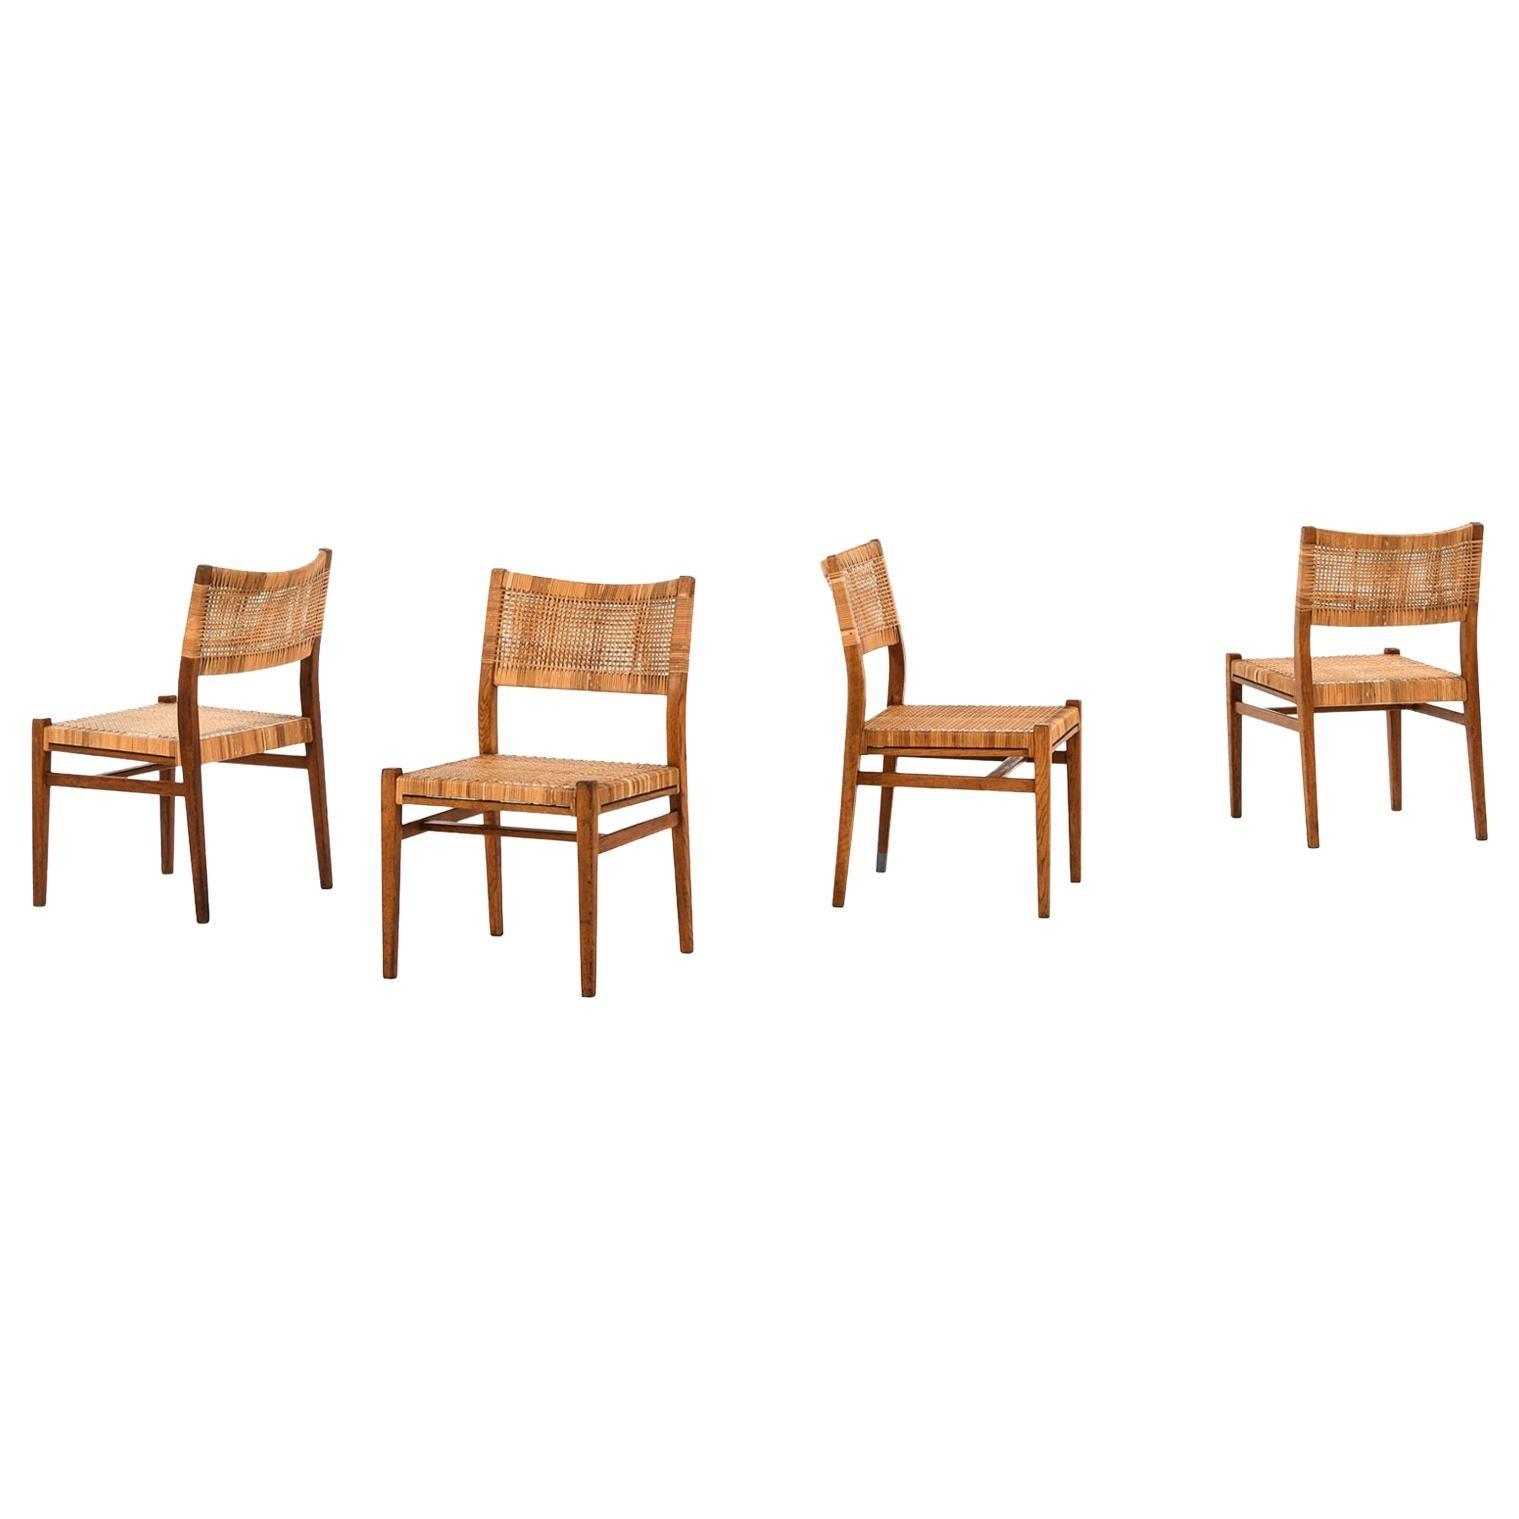 Erik Wørts Dining Chairs Produced in Denmark